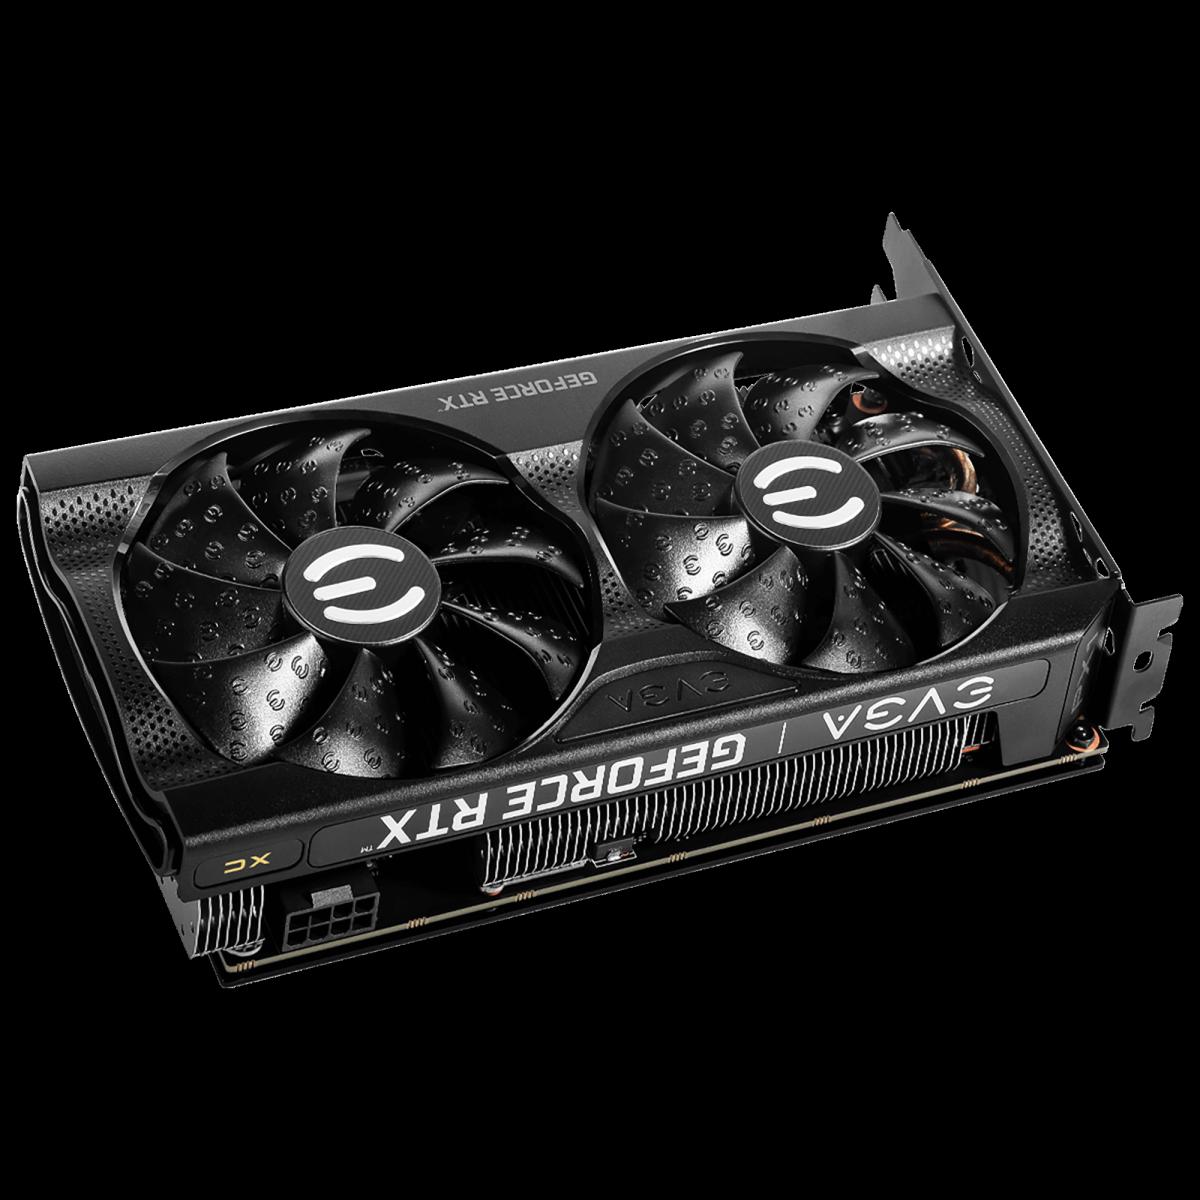 Placa de Vídeo EVGA GeForce RTX 3060 XC Gaming Dual Fan, 12GB, GDDR6, 192bit, LHR, 12G-P5-3657-KR